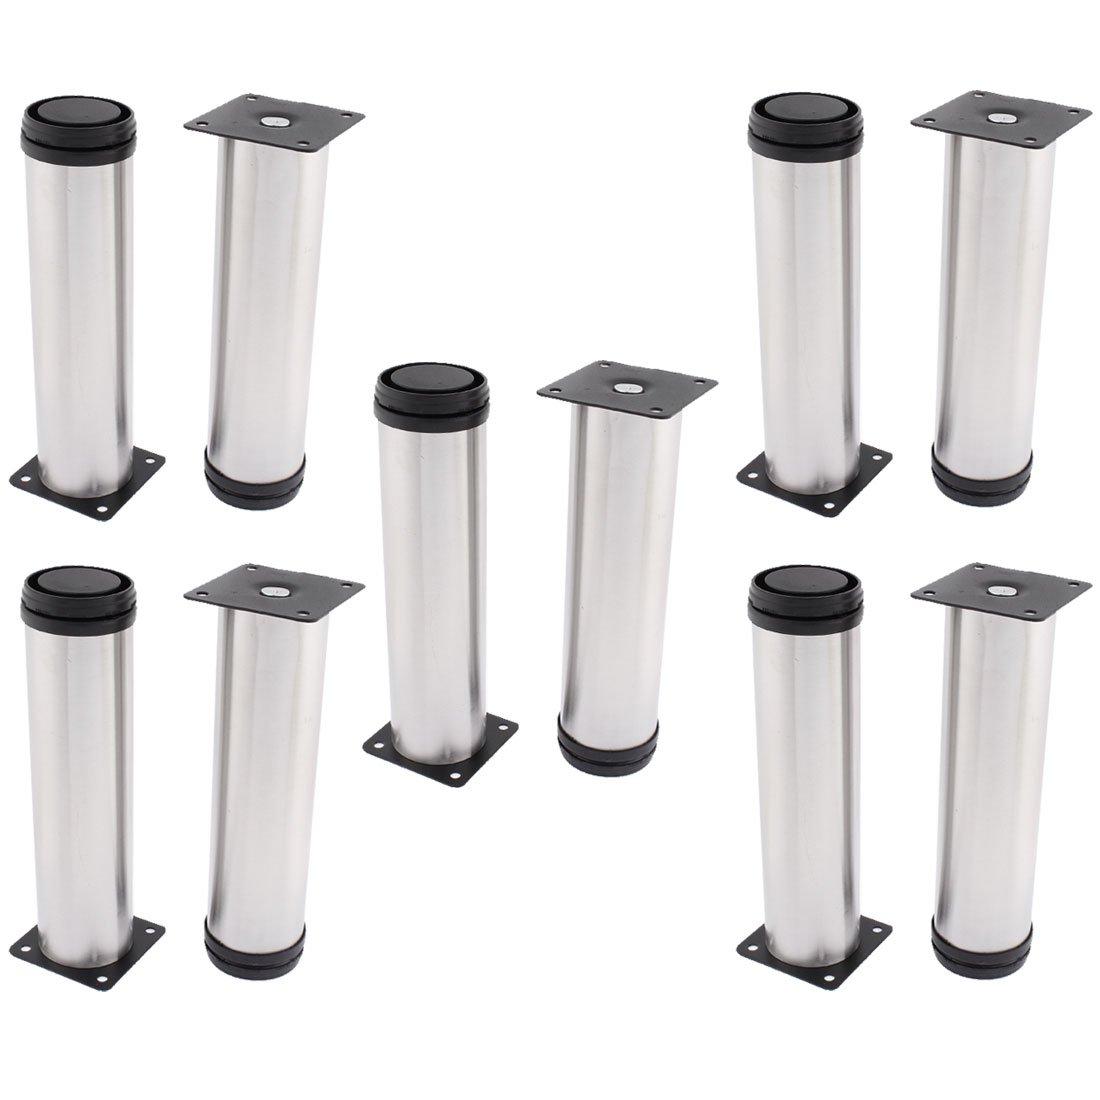 uxcell Kitchen Cabinet Furniture 50mm x 200mm Adjustable Plinth Leg 10pcs